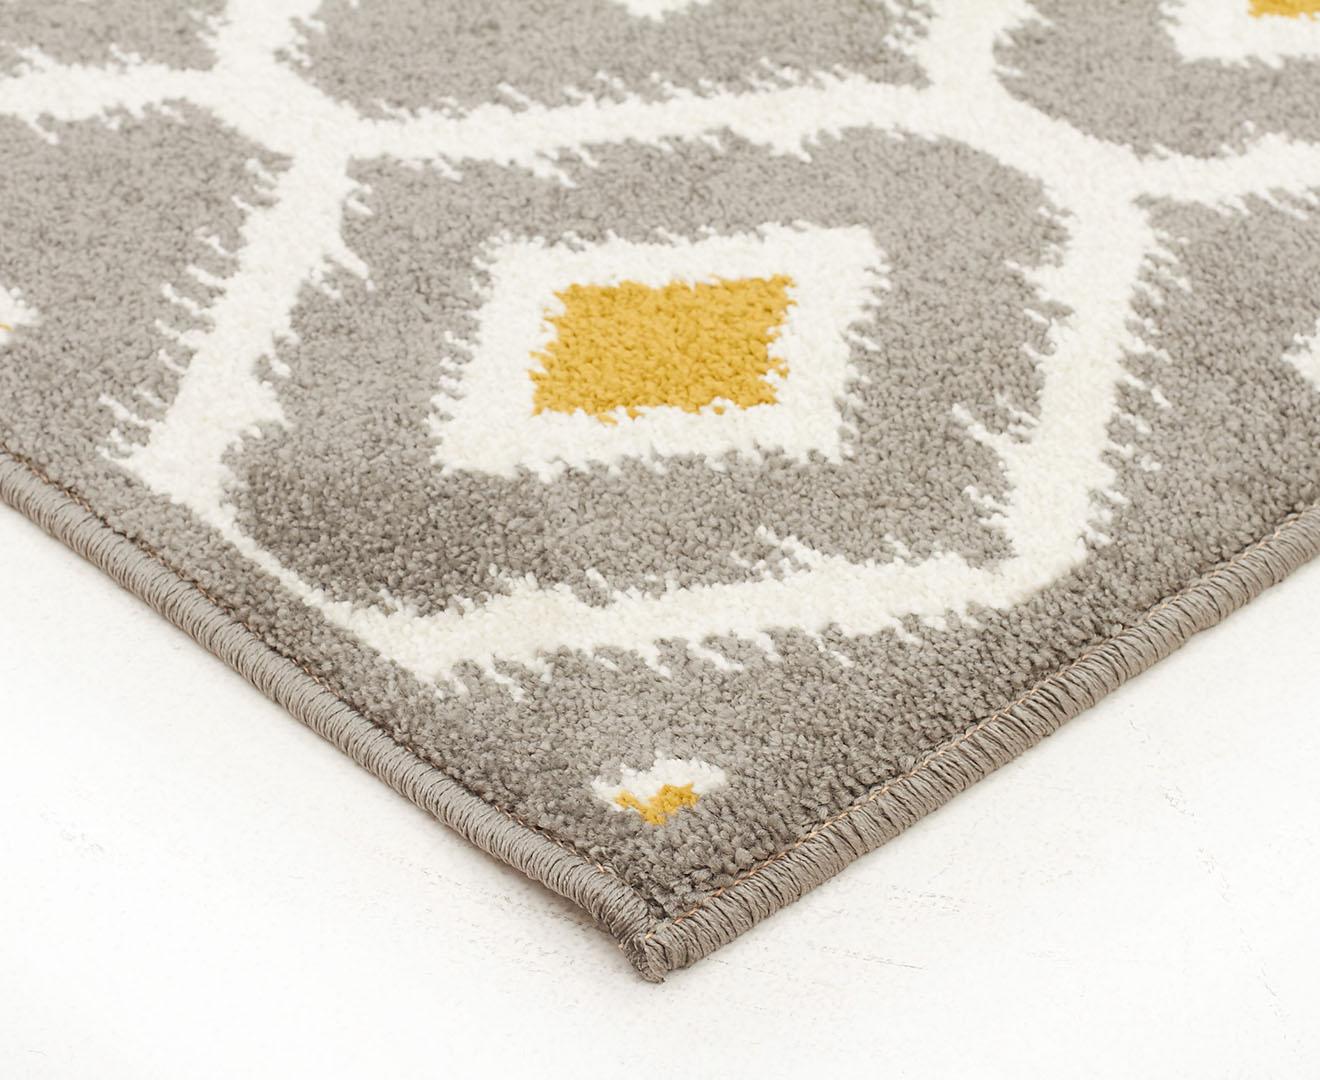 maldives 290x200cm new geometry rug grey yellow white. Black Bedroom Furniture Sets. Home Design Ideas